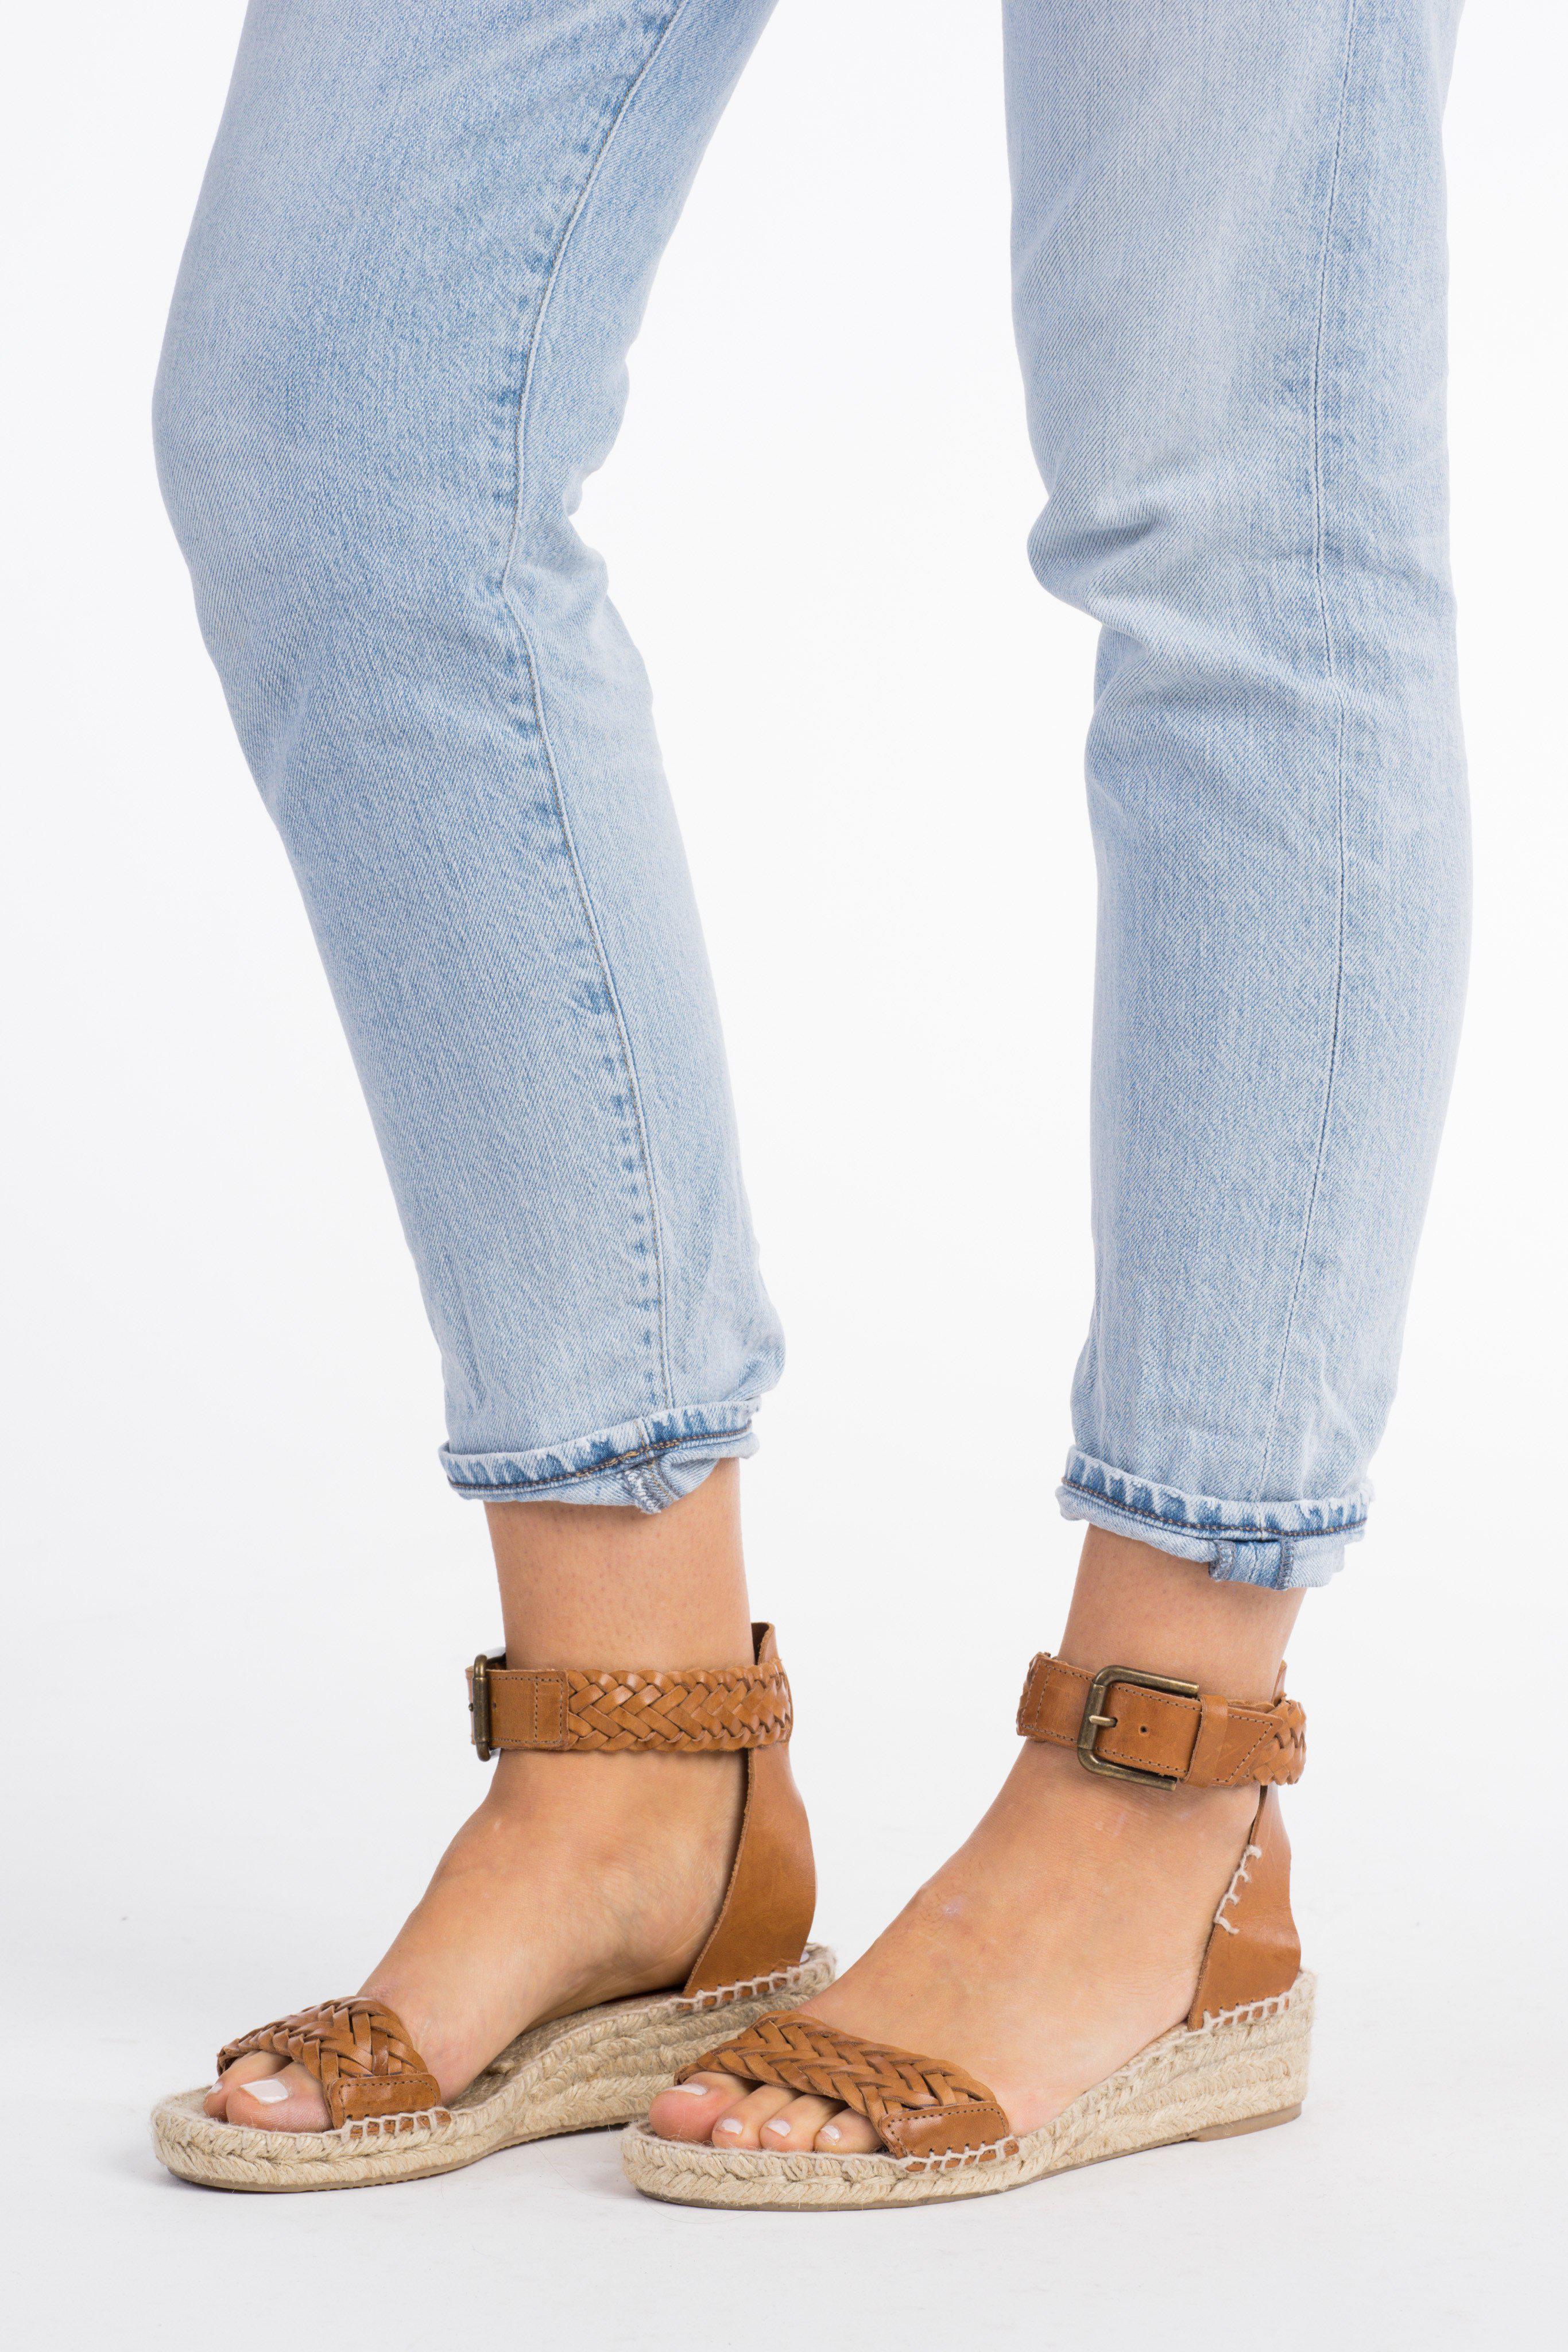 0abd1df51b7 Lyst - Soludos Soludos Woven Demi Wedge Sandal in Blue